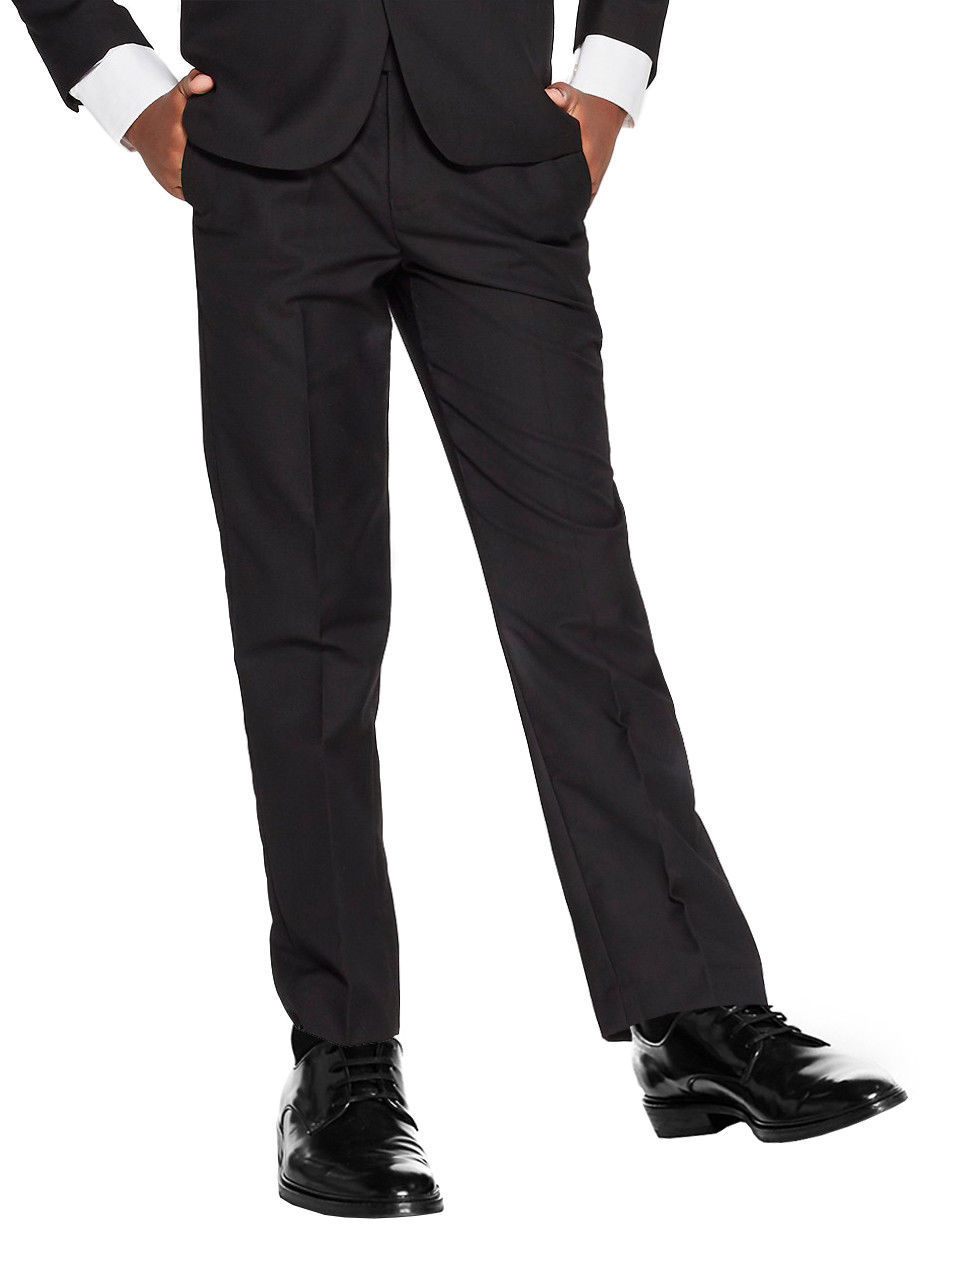 vkwear Boys Kids Juniors Slim Fit Flat Front Dress Pants Slacks with Belt